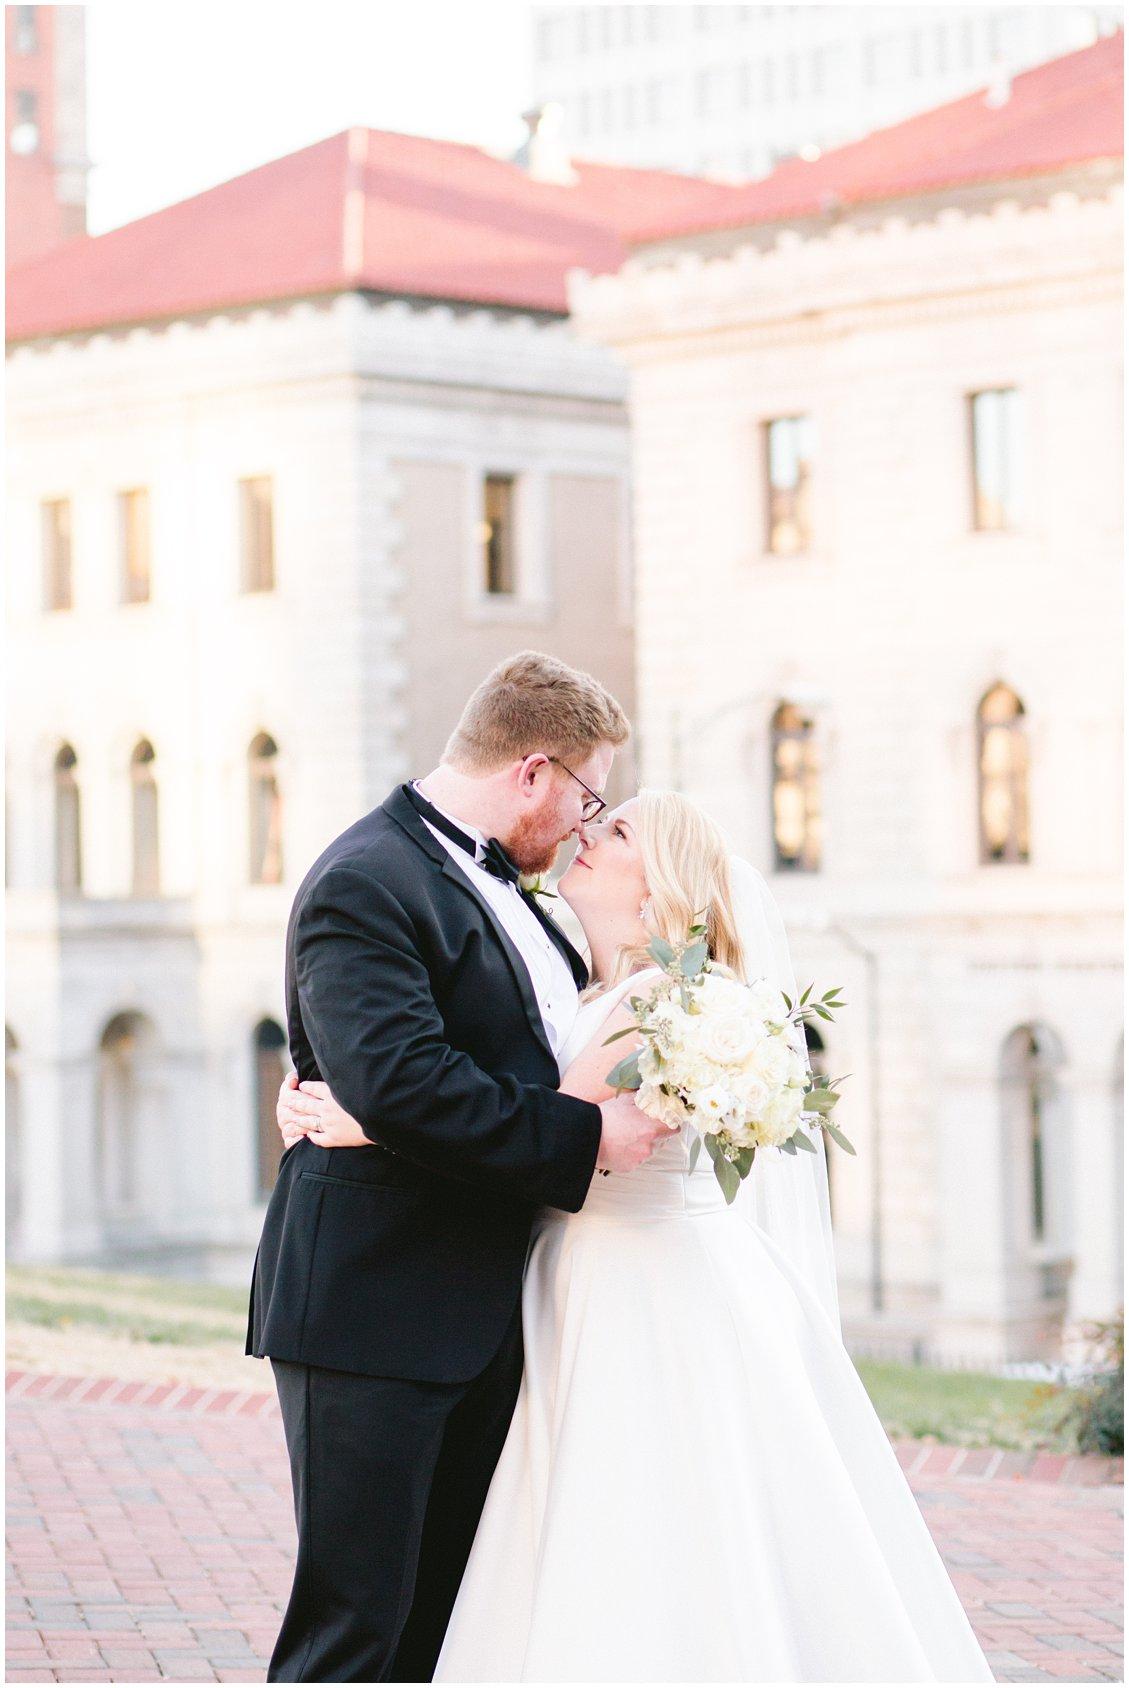 A downtown Richmond Virginia winter wedding by Tara & Stephen - a husband and wife adventure photography team